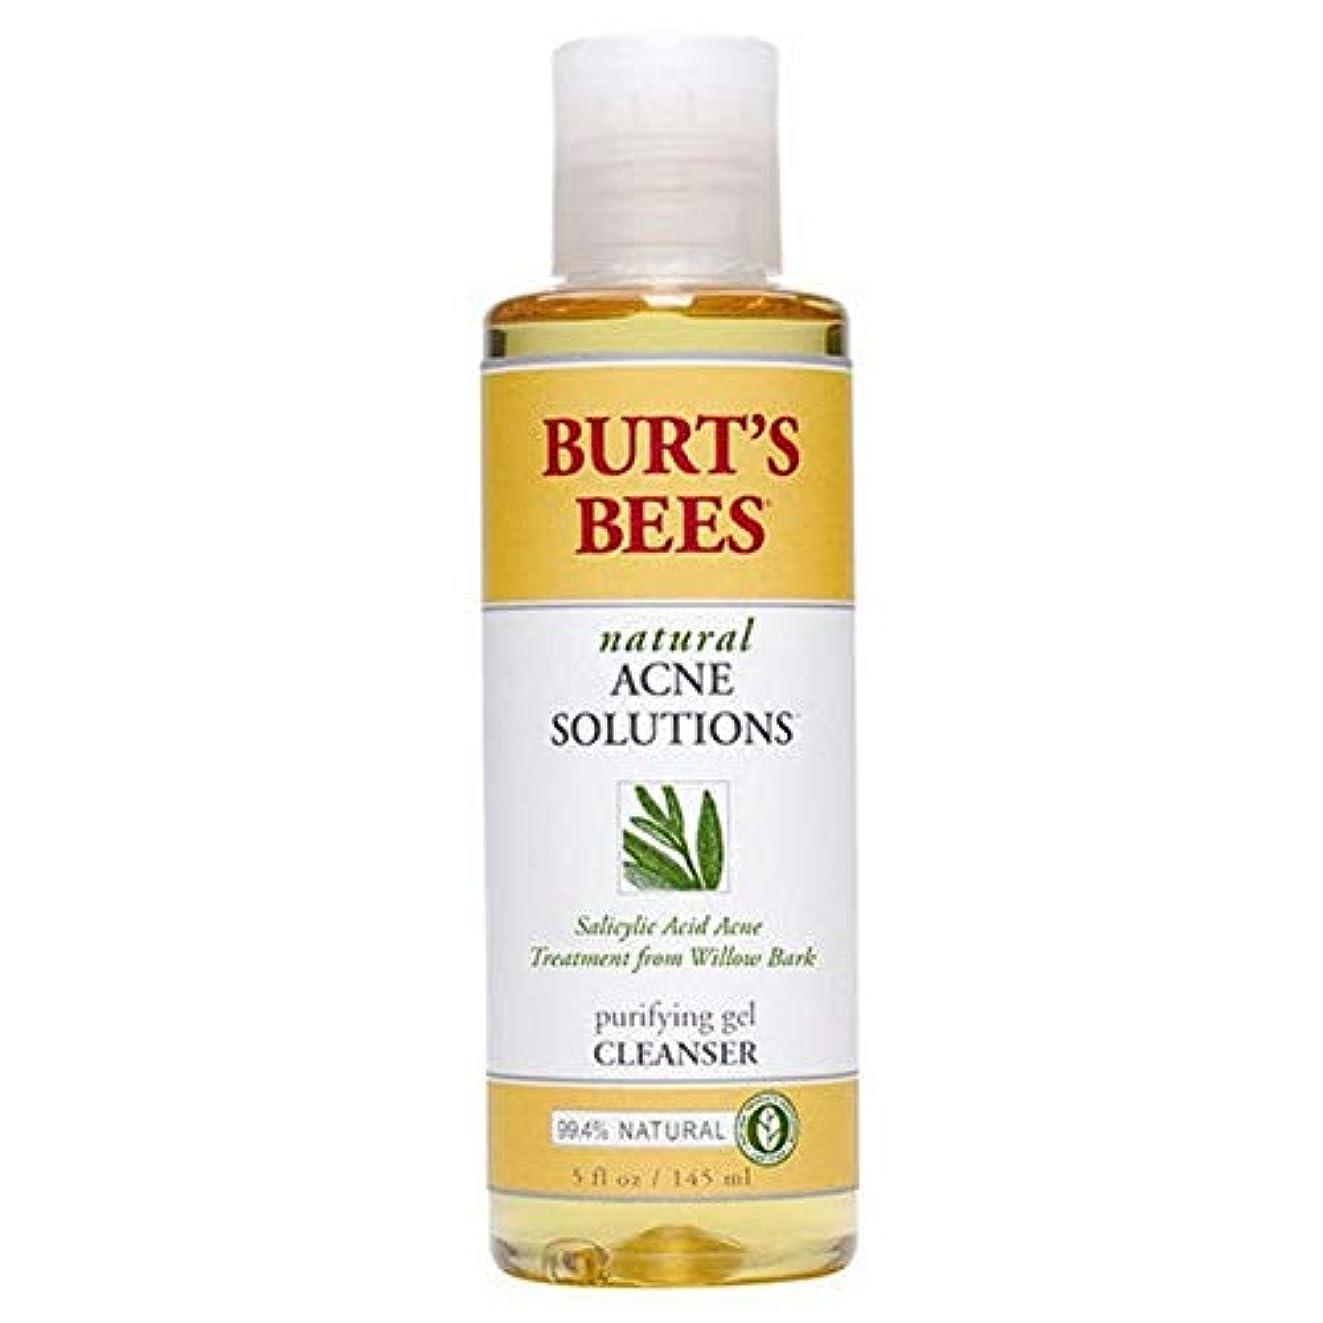 [Burt's Bees ] バーツビー反傷毎日クレンザー、145ミリリットル - Burt's Bees Anti Blemish Daily Cleanser, 145ml [並行輸入品]